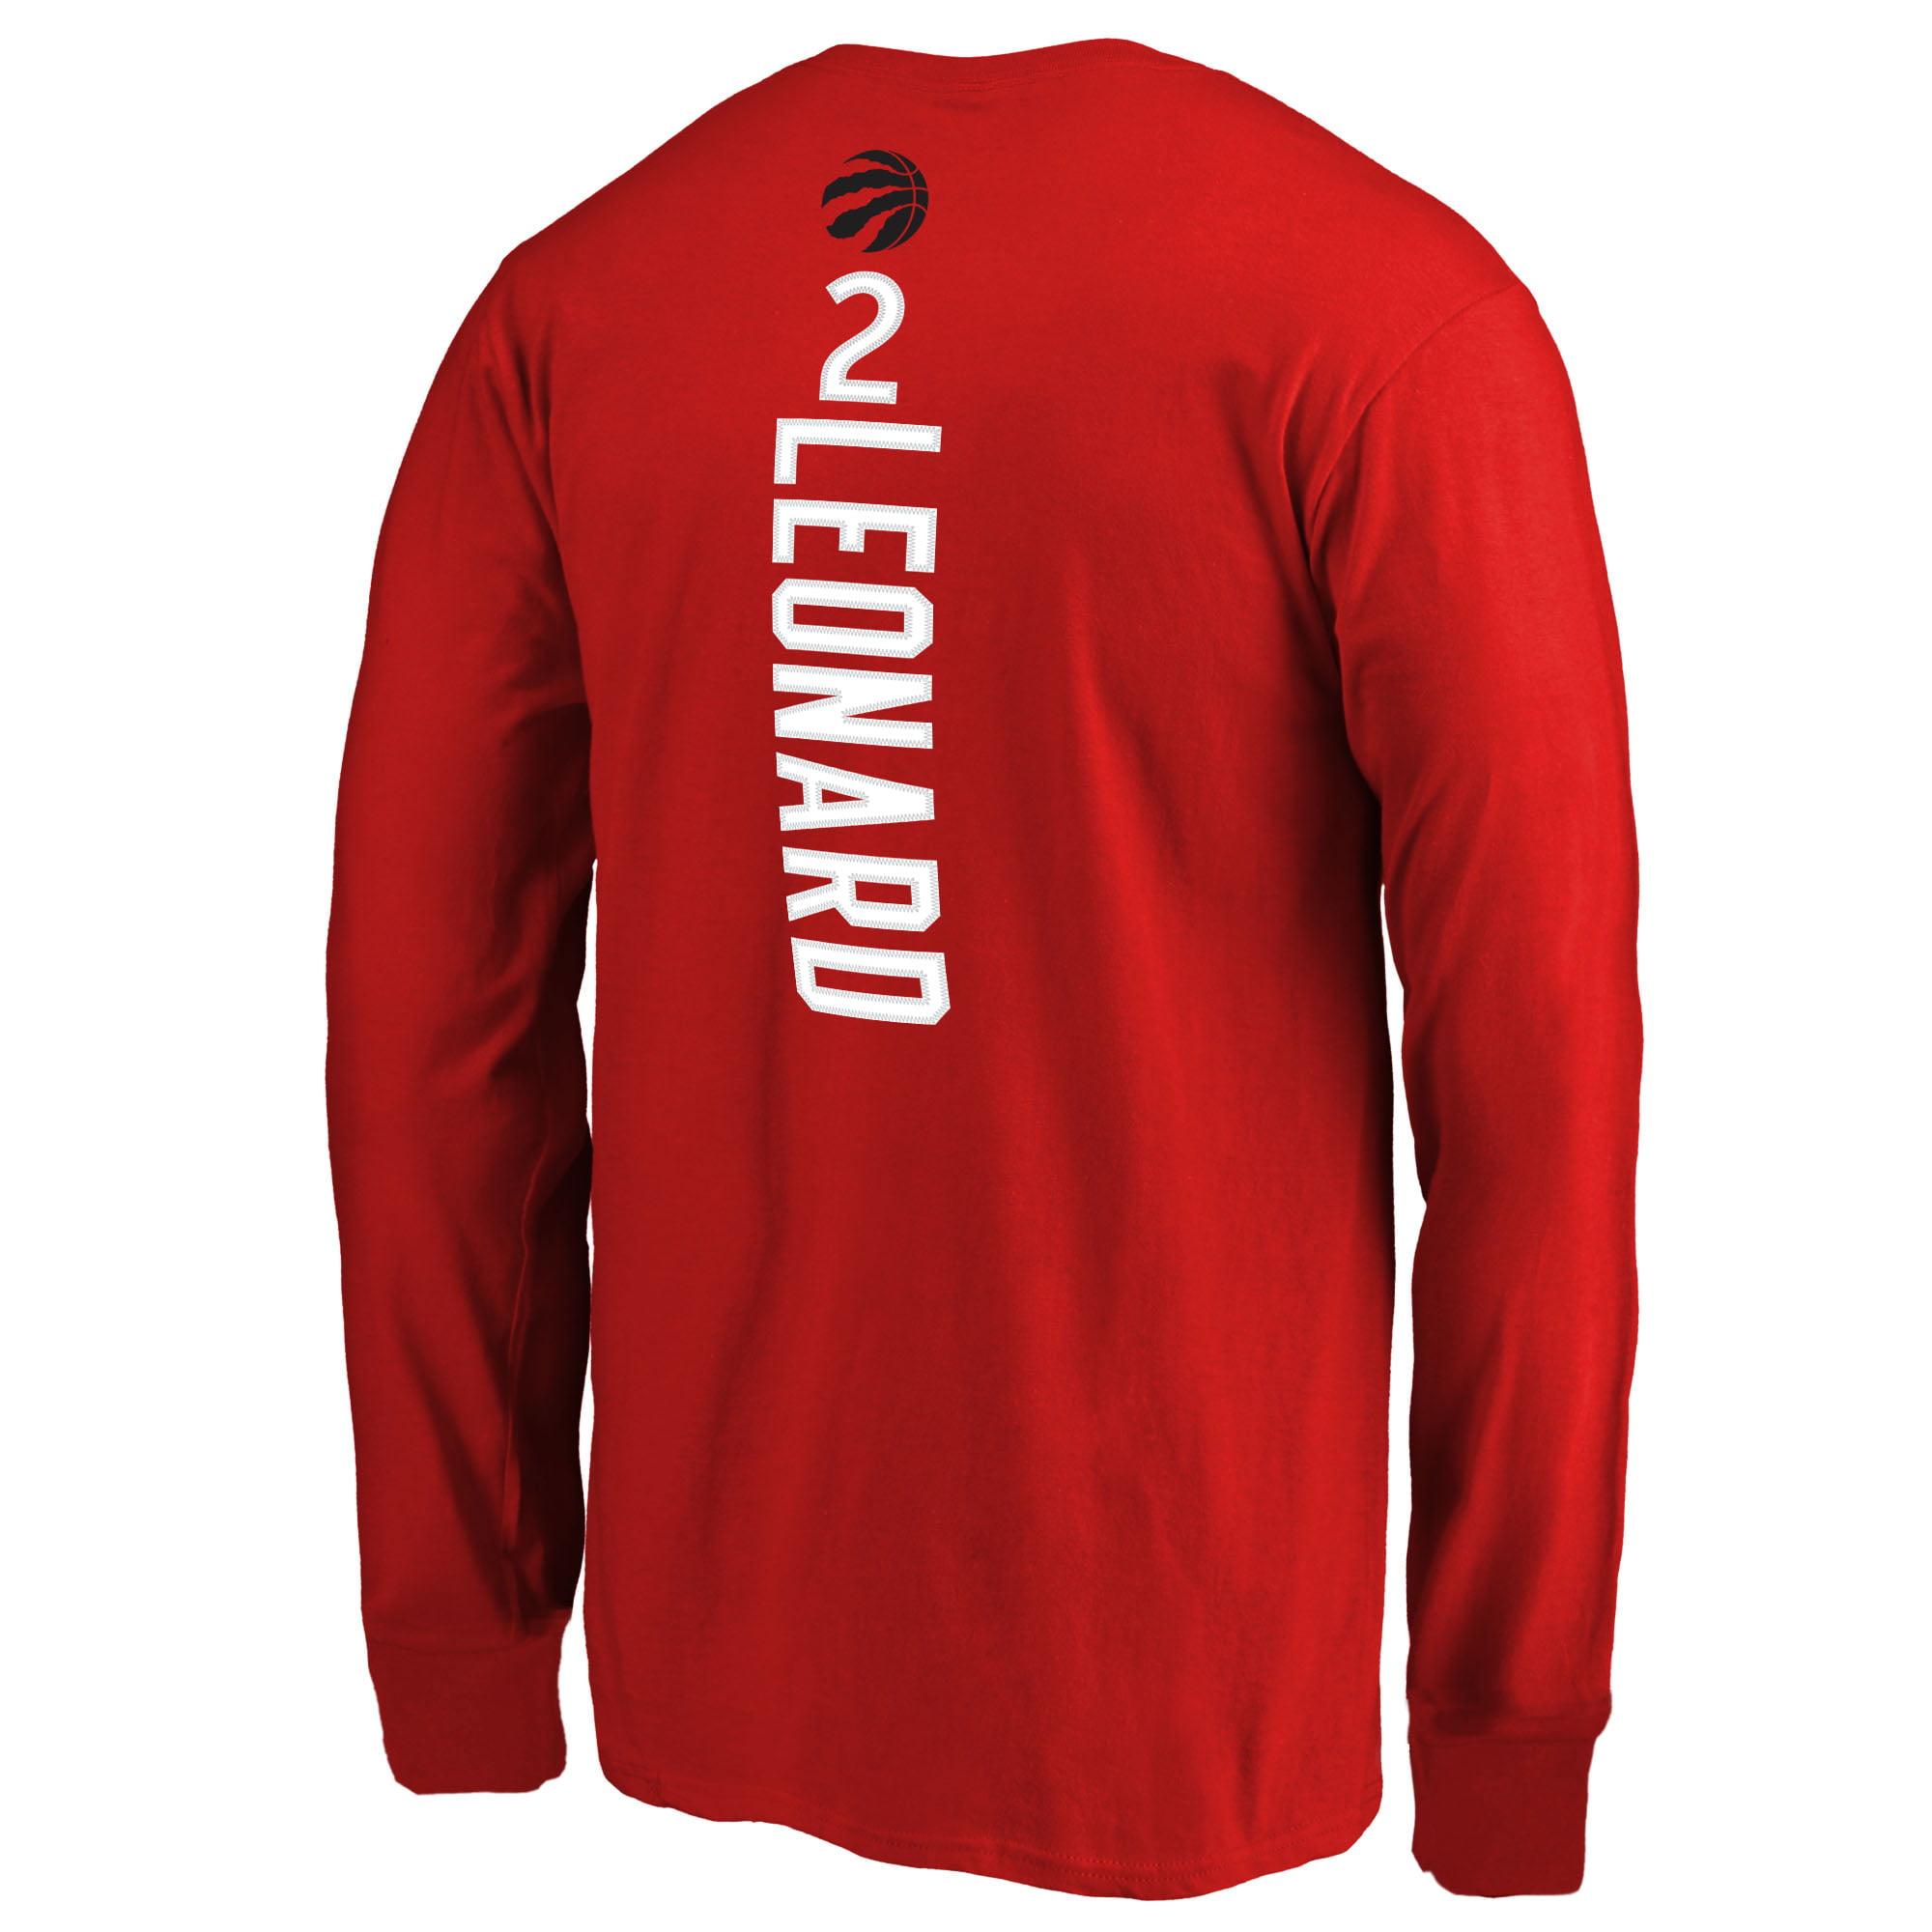 b7b32a58dcc Kawhi Leonard Toronto Raptors Fanatics Branded Youth Team Backer Name    Number Long Sleeve T-Shirt - Red - Walmart.com